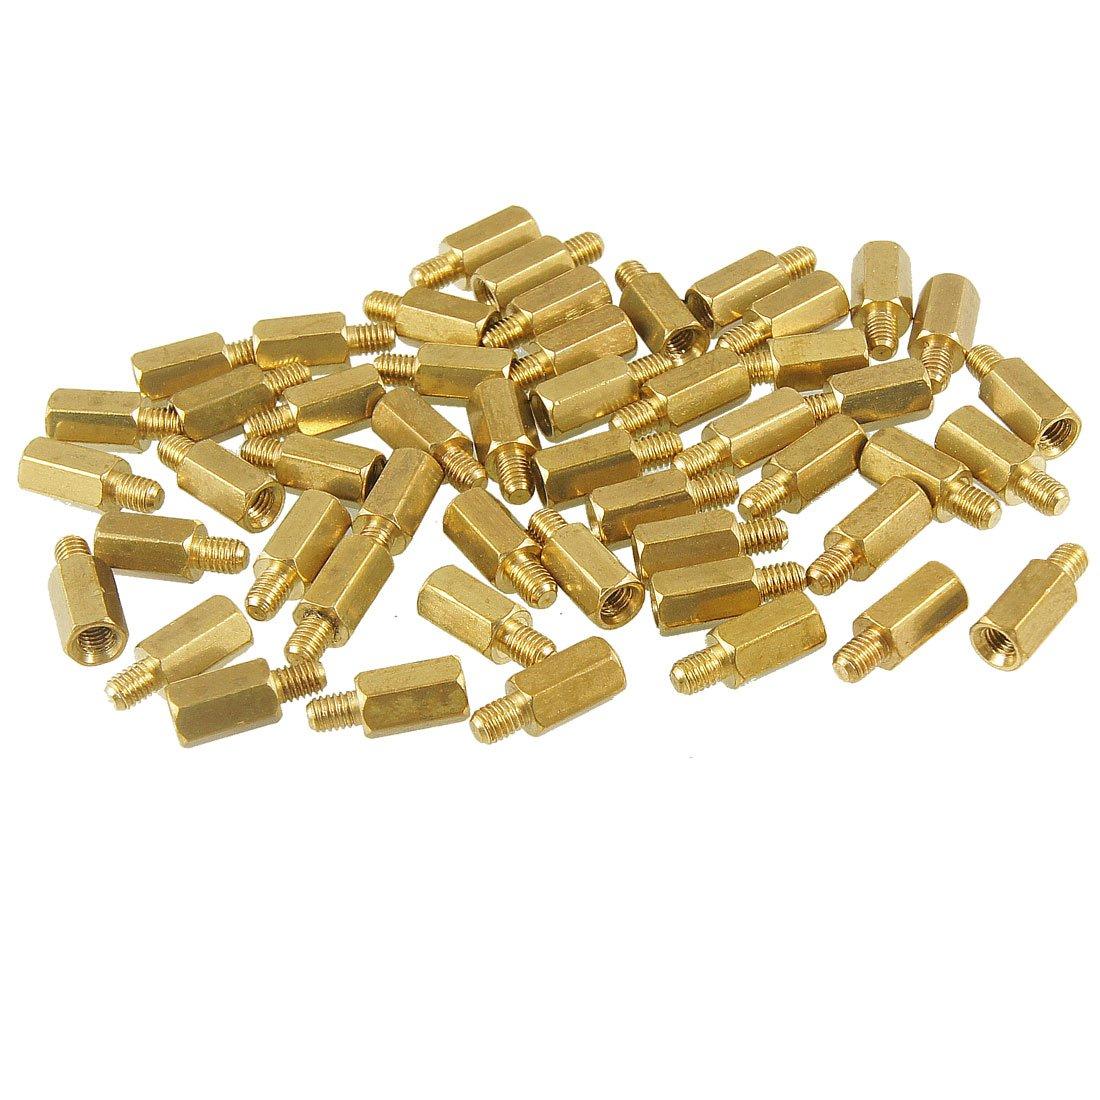 CLOS M3 Male x M3 Female 8mm Long Hexagonal Brass PCB Standoffs Spacers 50 Pcs 20 pcs m3 x 20mm x 26mm male to female pcb hexagonal nut standoff spacer